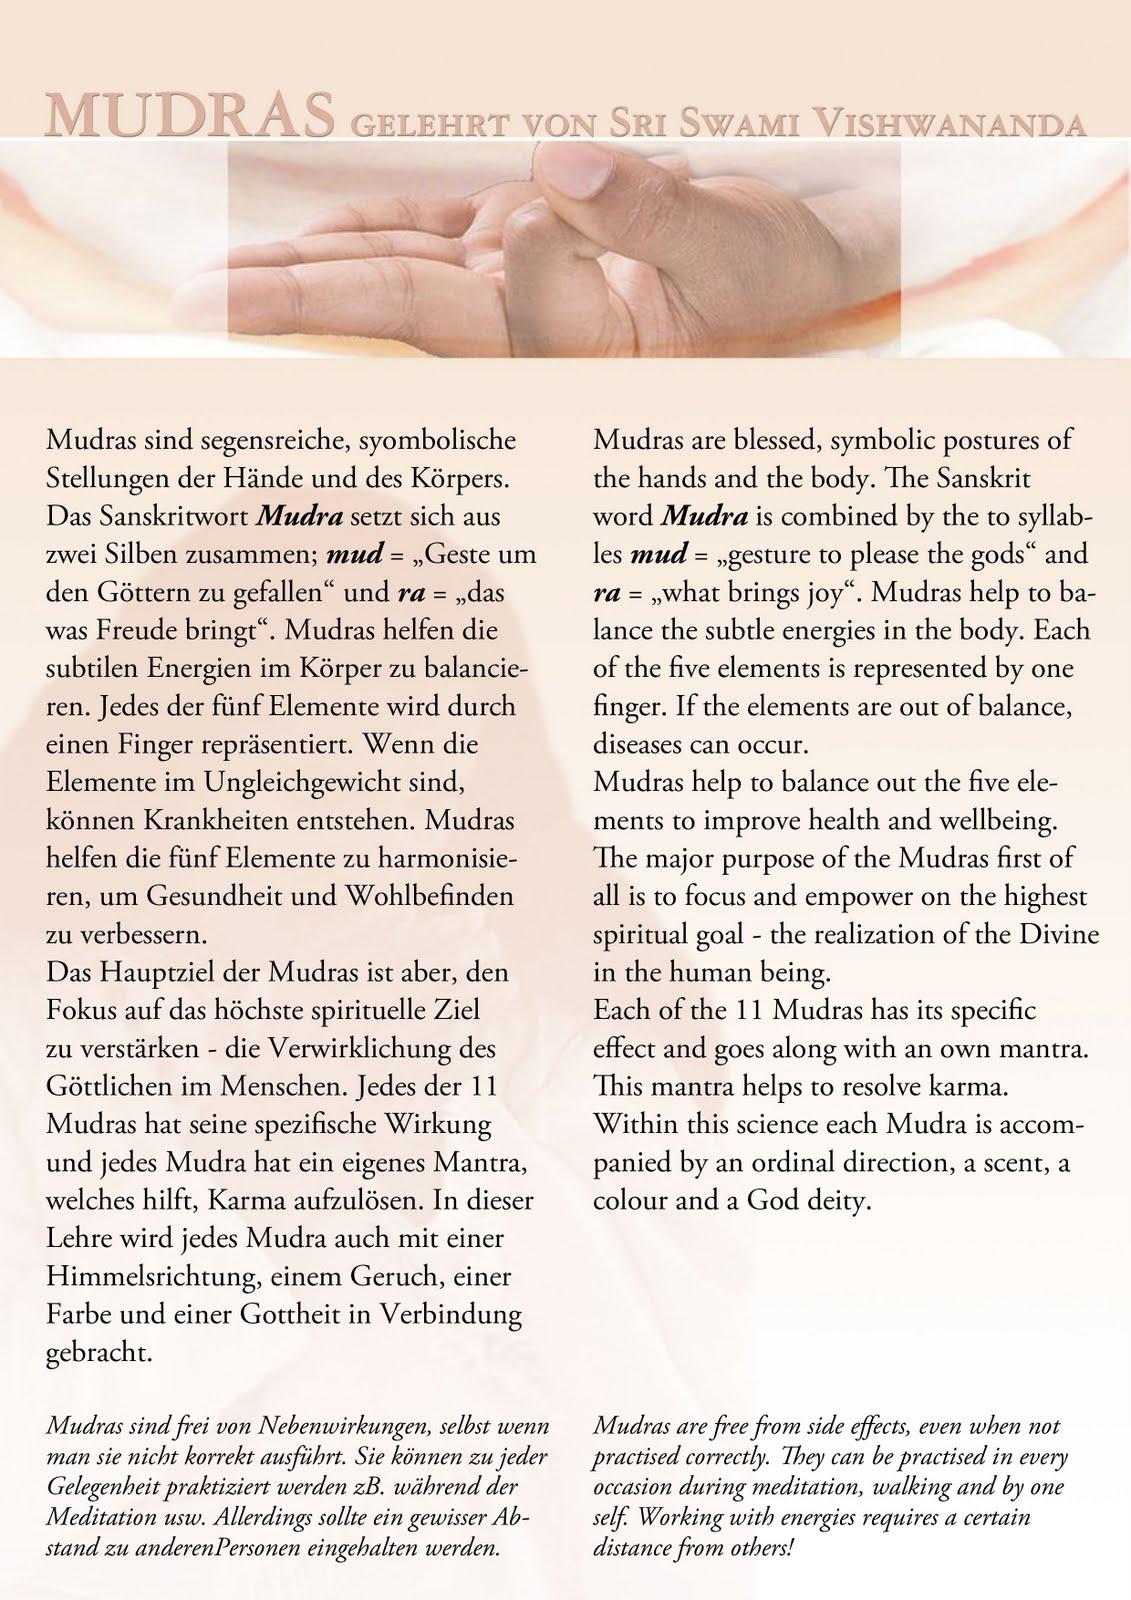 Swami Vishwananda Teachings: Sri Swami Vishwananda - MUDRAS